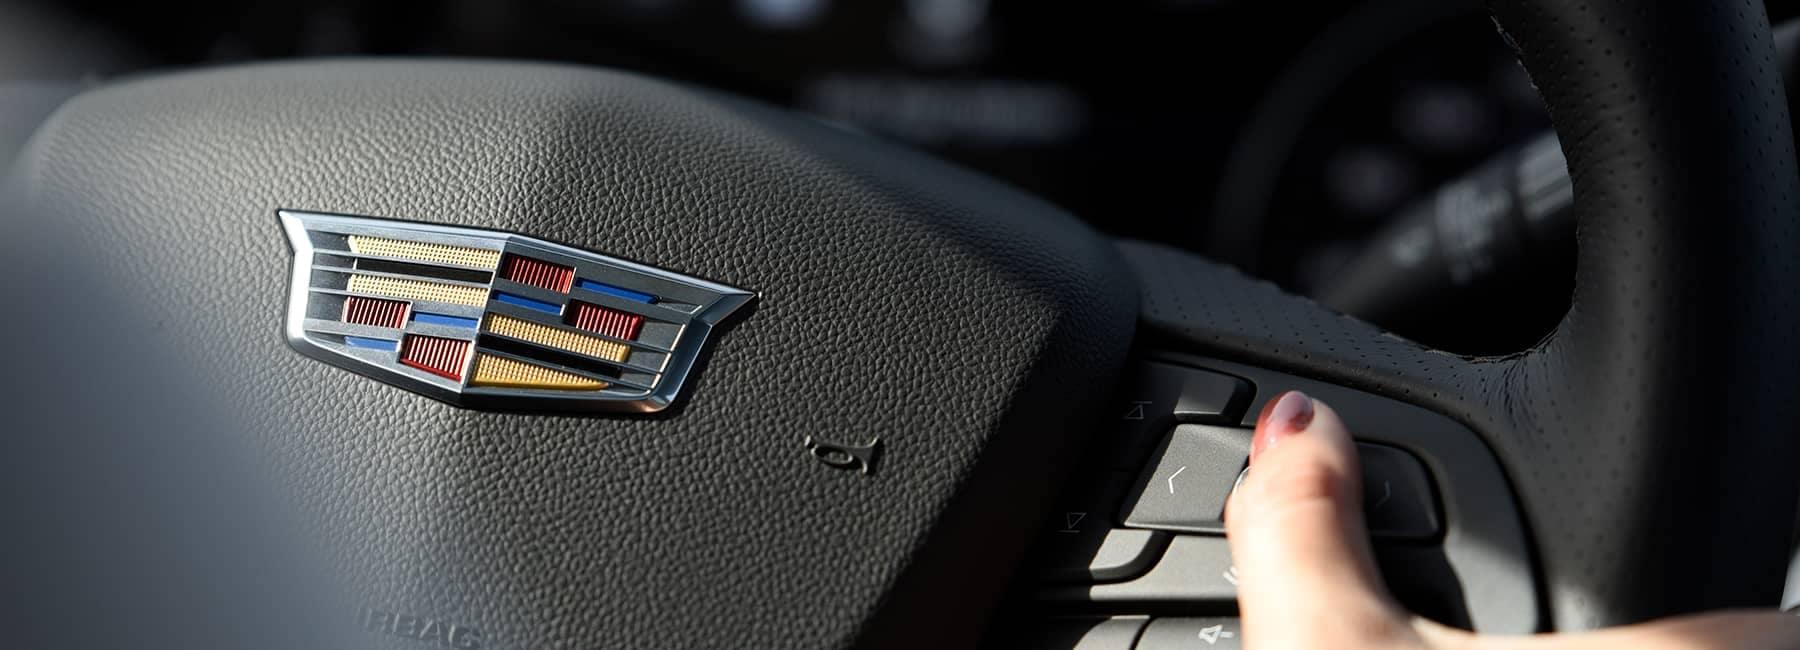 Cadillac Steering Wheel With Emblem